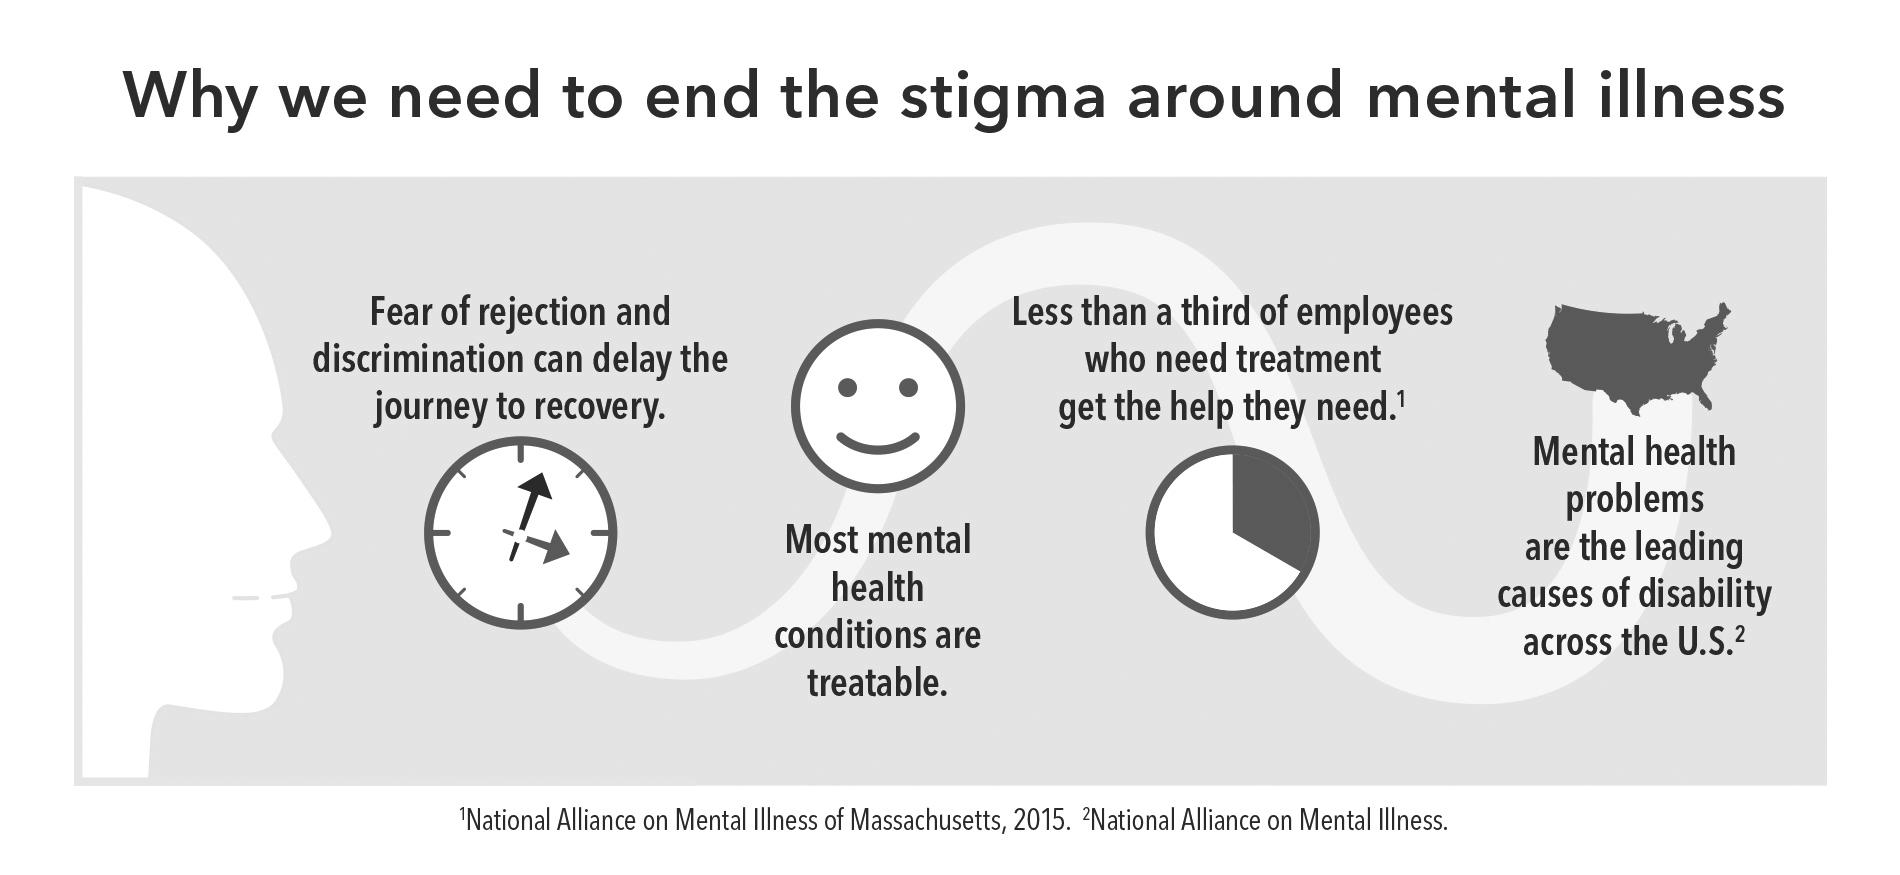 Counselor Tackles Depression Stigma The Bona Venture